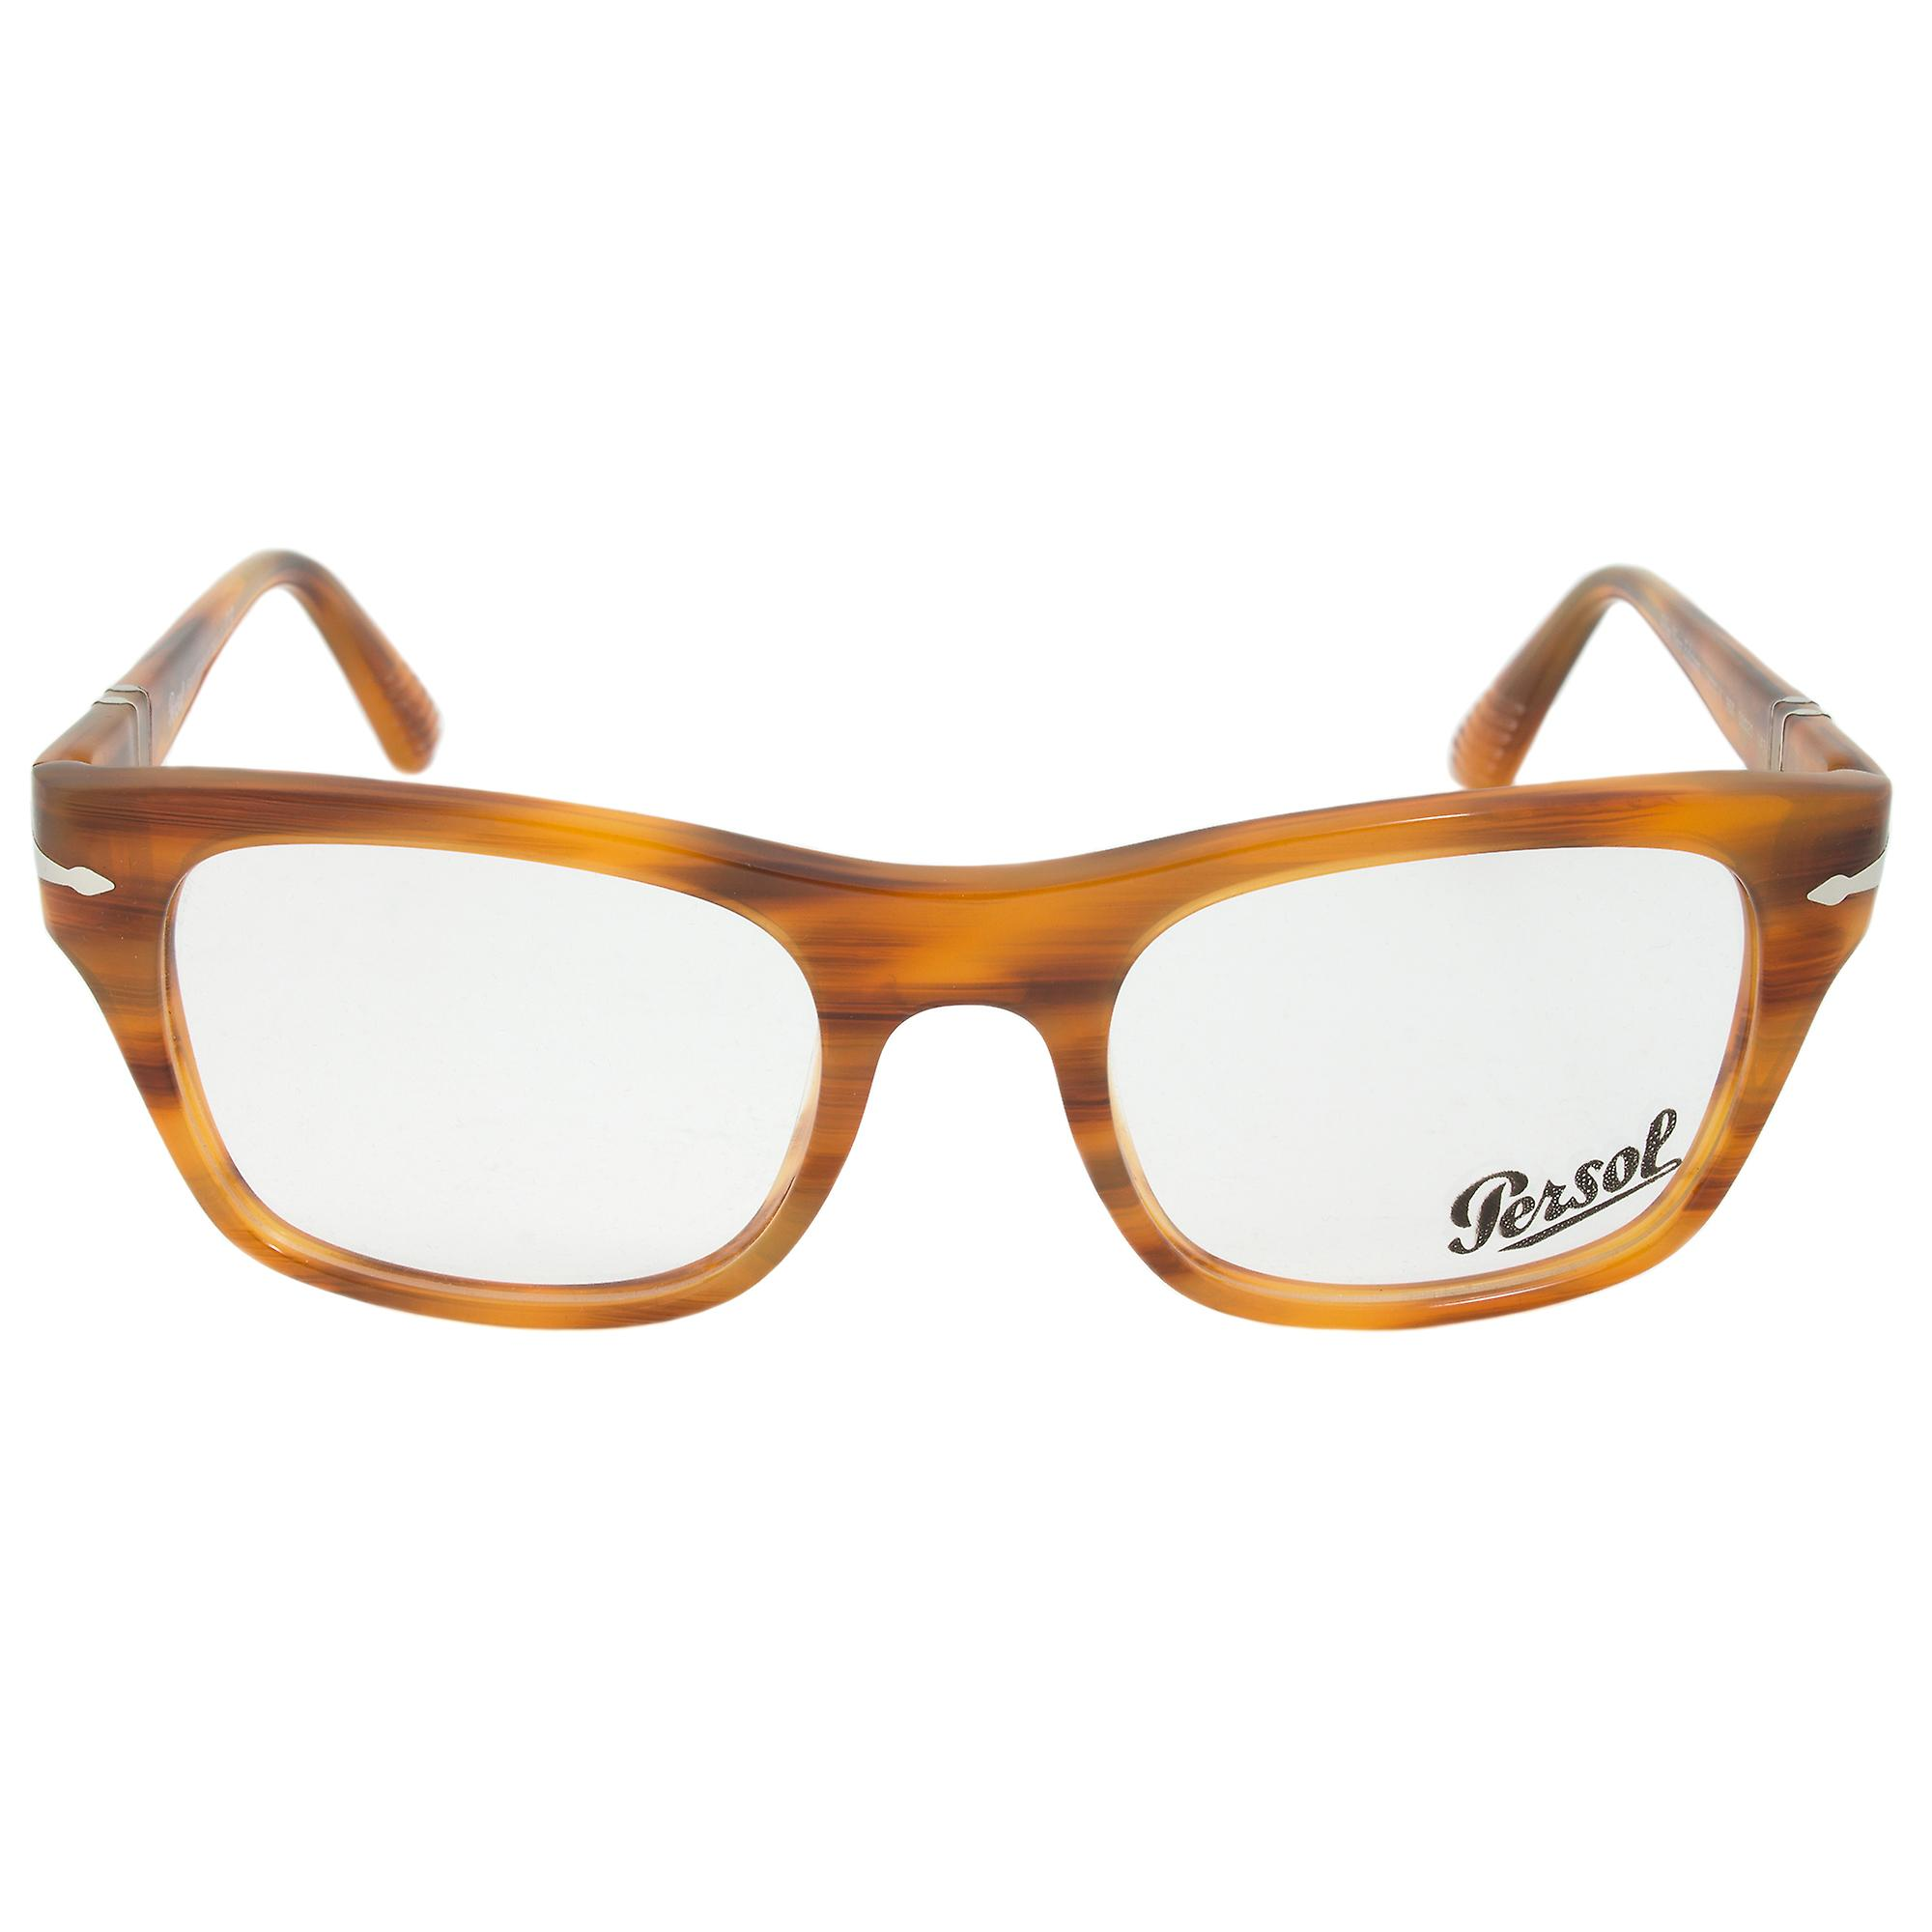 Persol 0PO3070V 960 Rectangular | Striped Brown| Eyeglass Frames